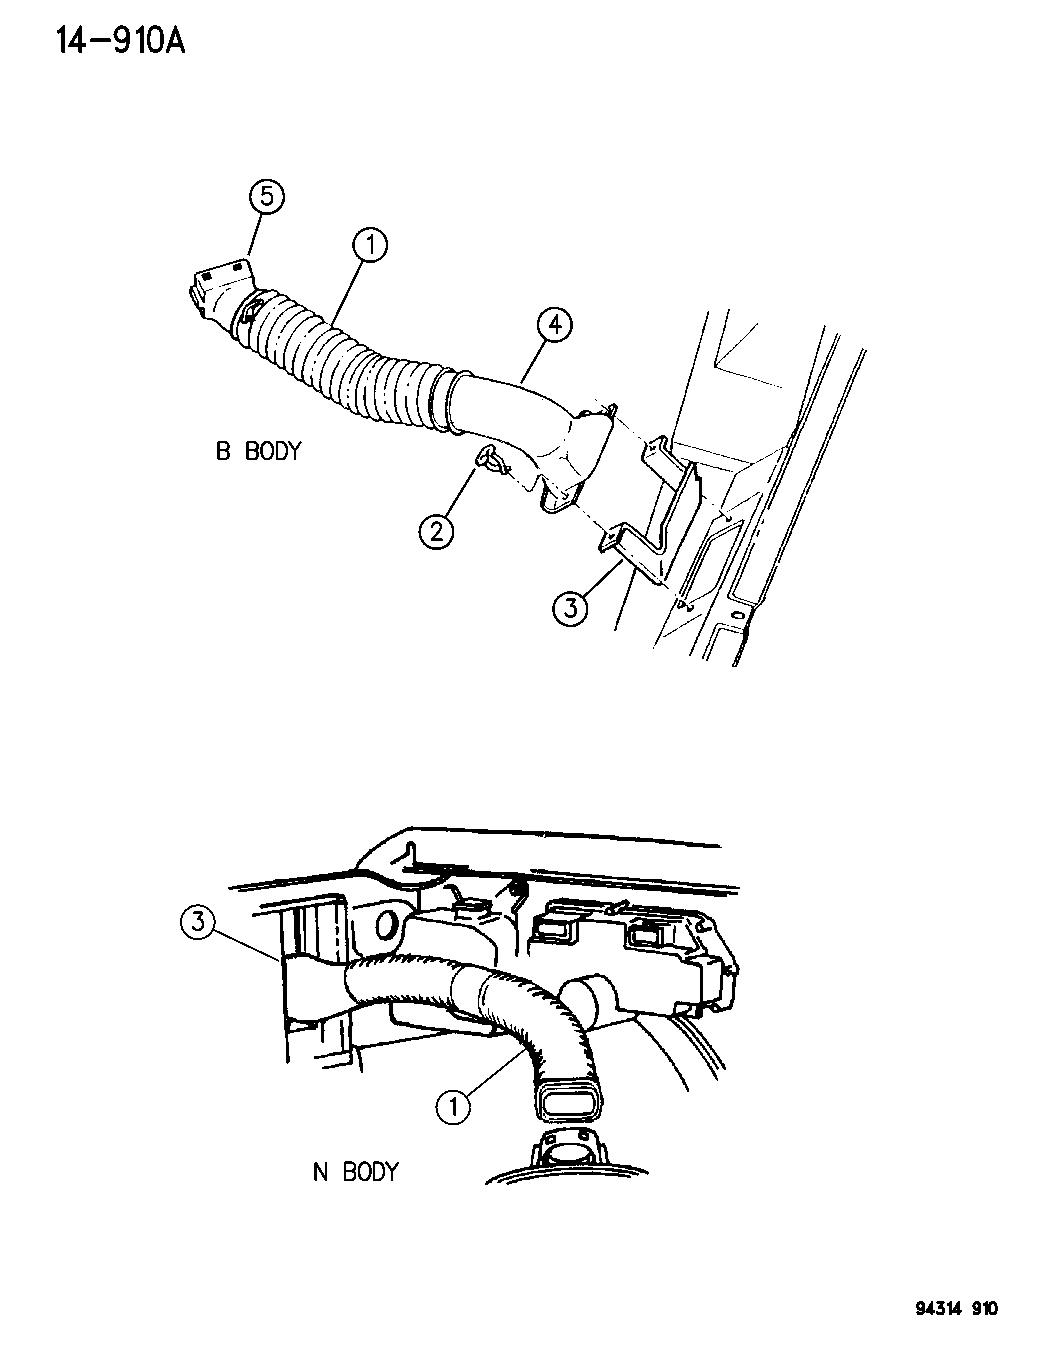 1994 dodge ram van air intake system